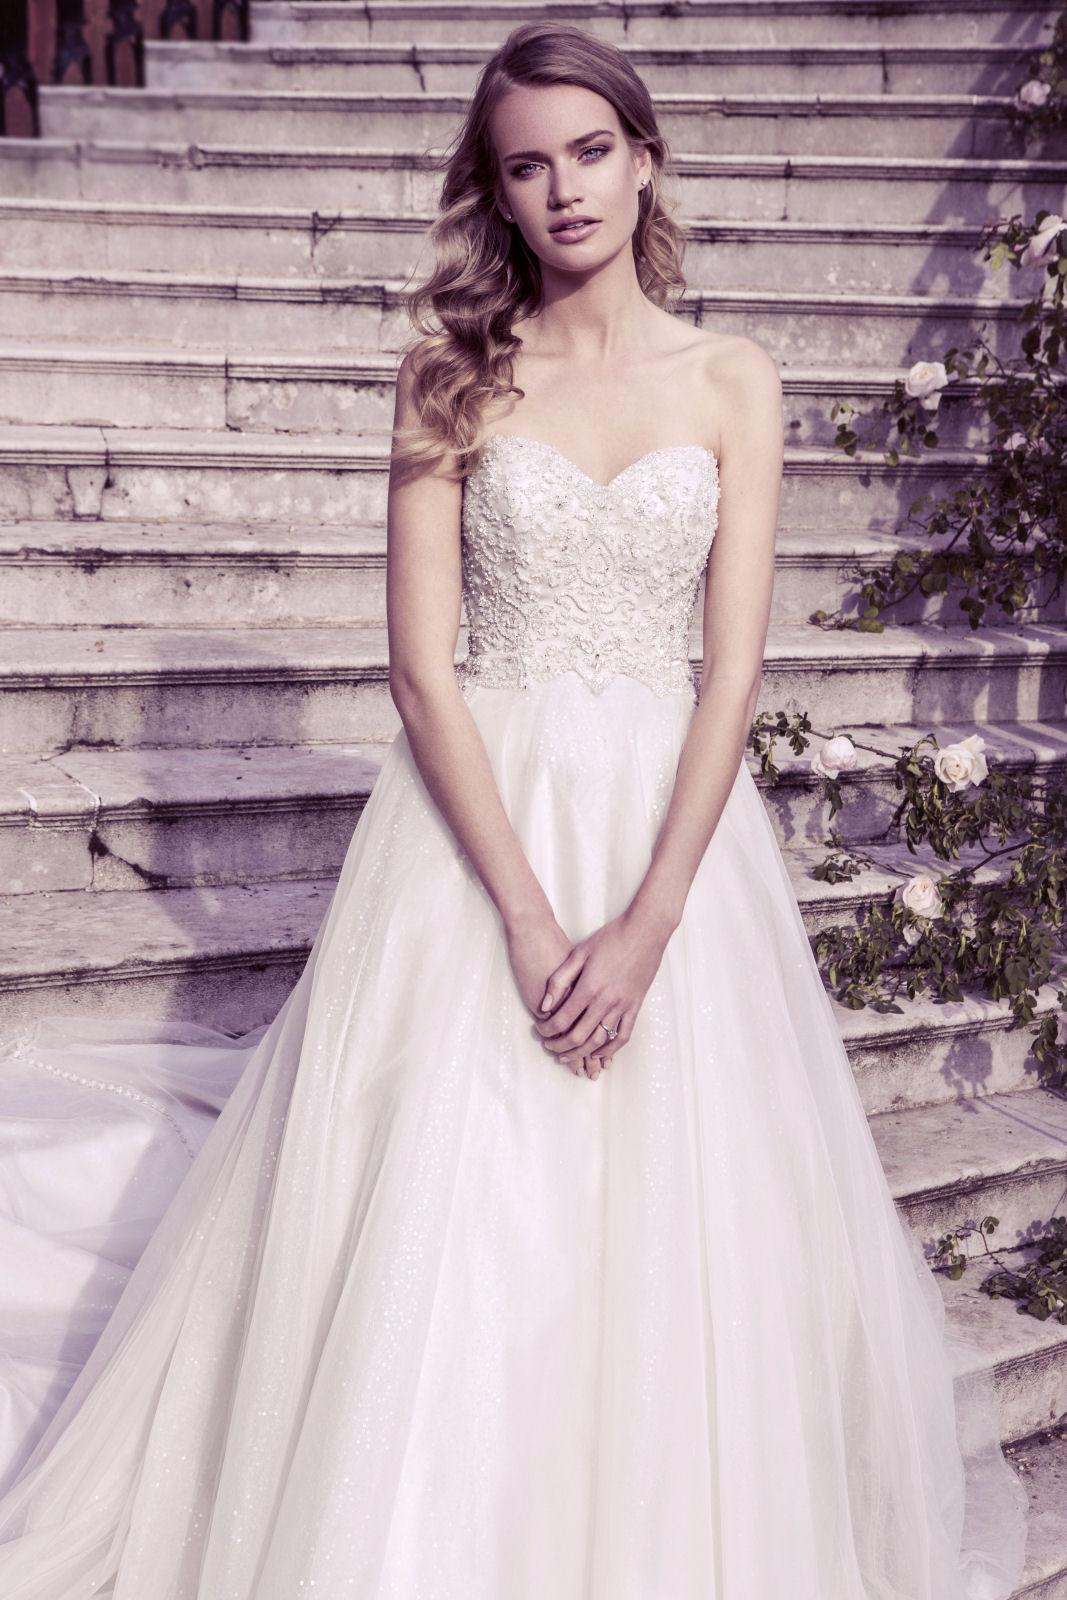 Brautkleider nahe paderborn